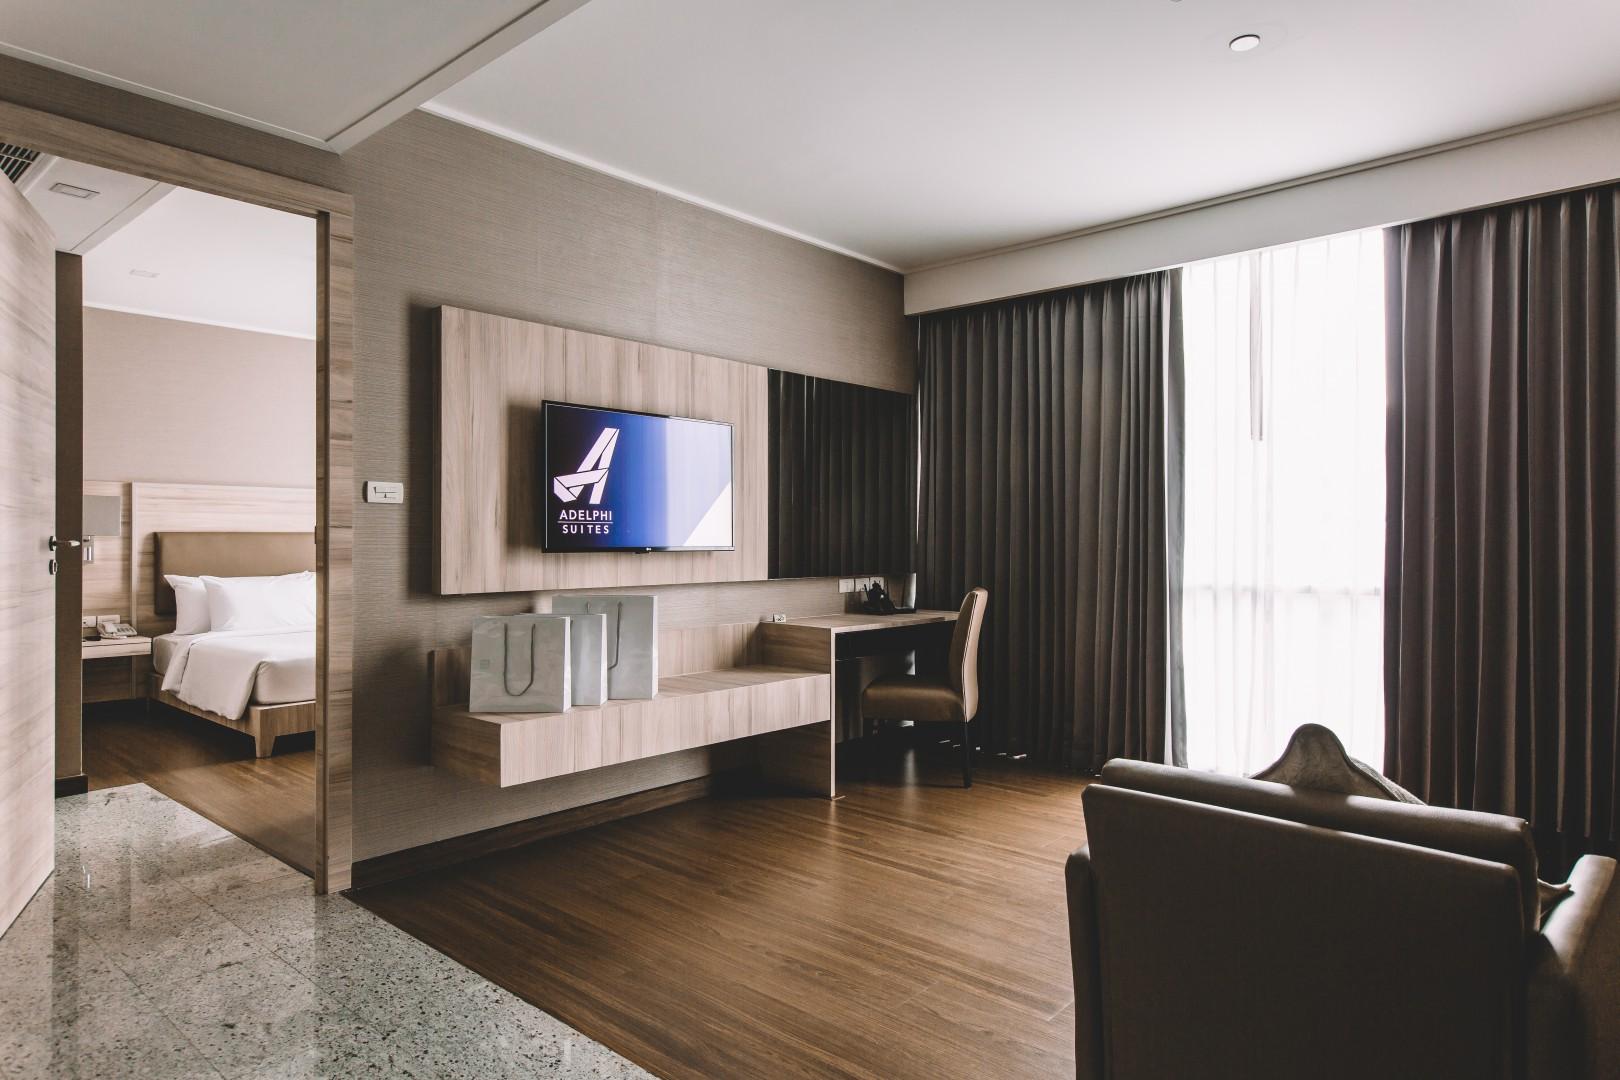 Adelphi-Suite-1-bed-premier-banner.jpg